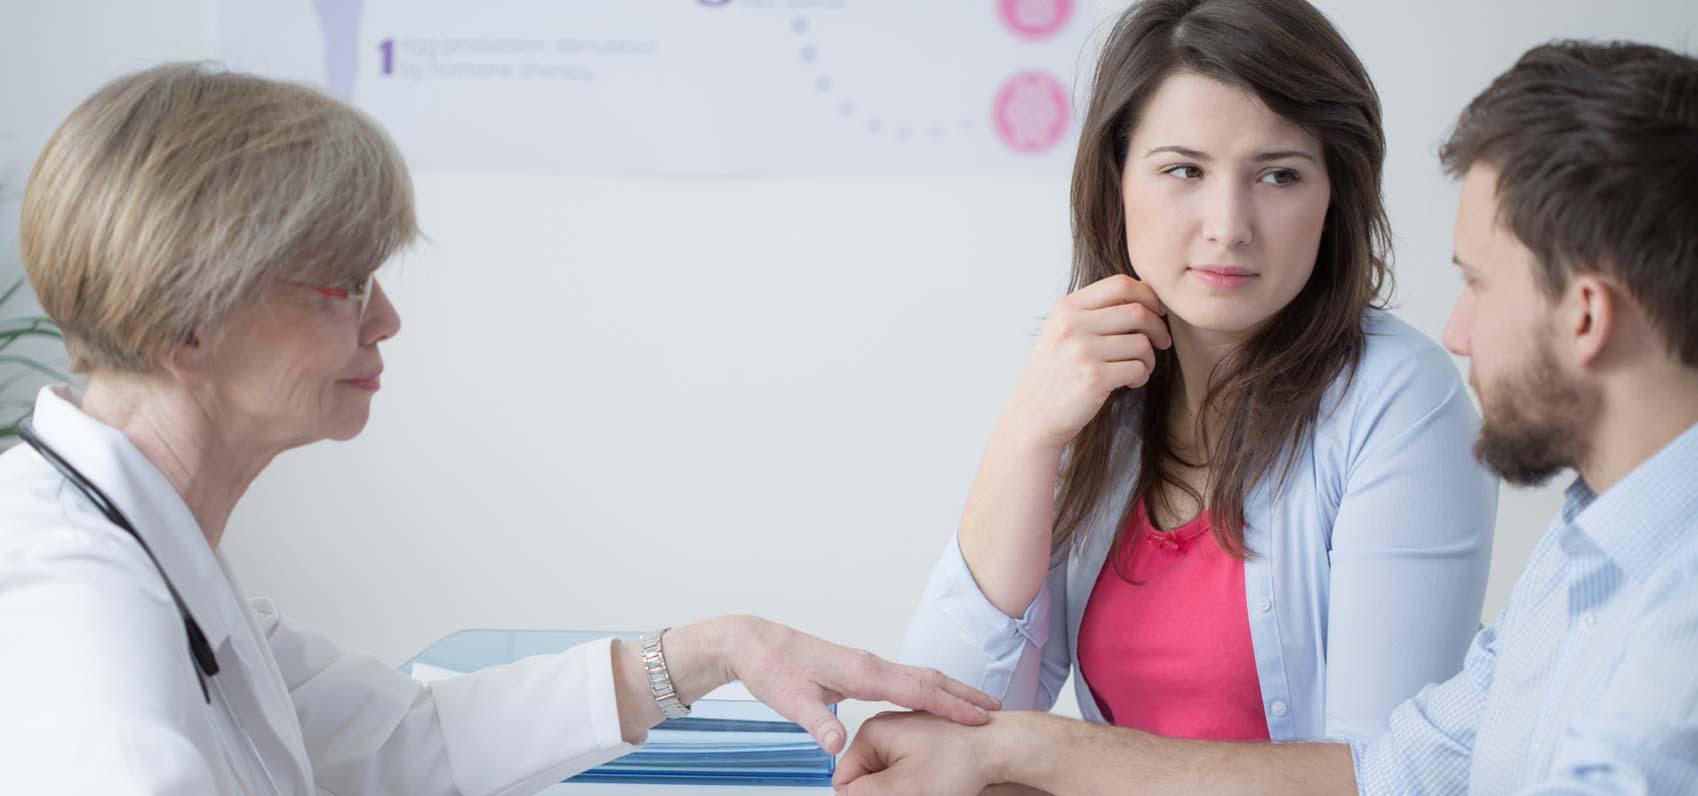 Consulta de EMECE en Palma de Mallorca para el aborto quirúrgico